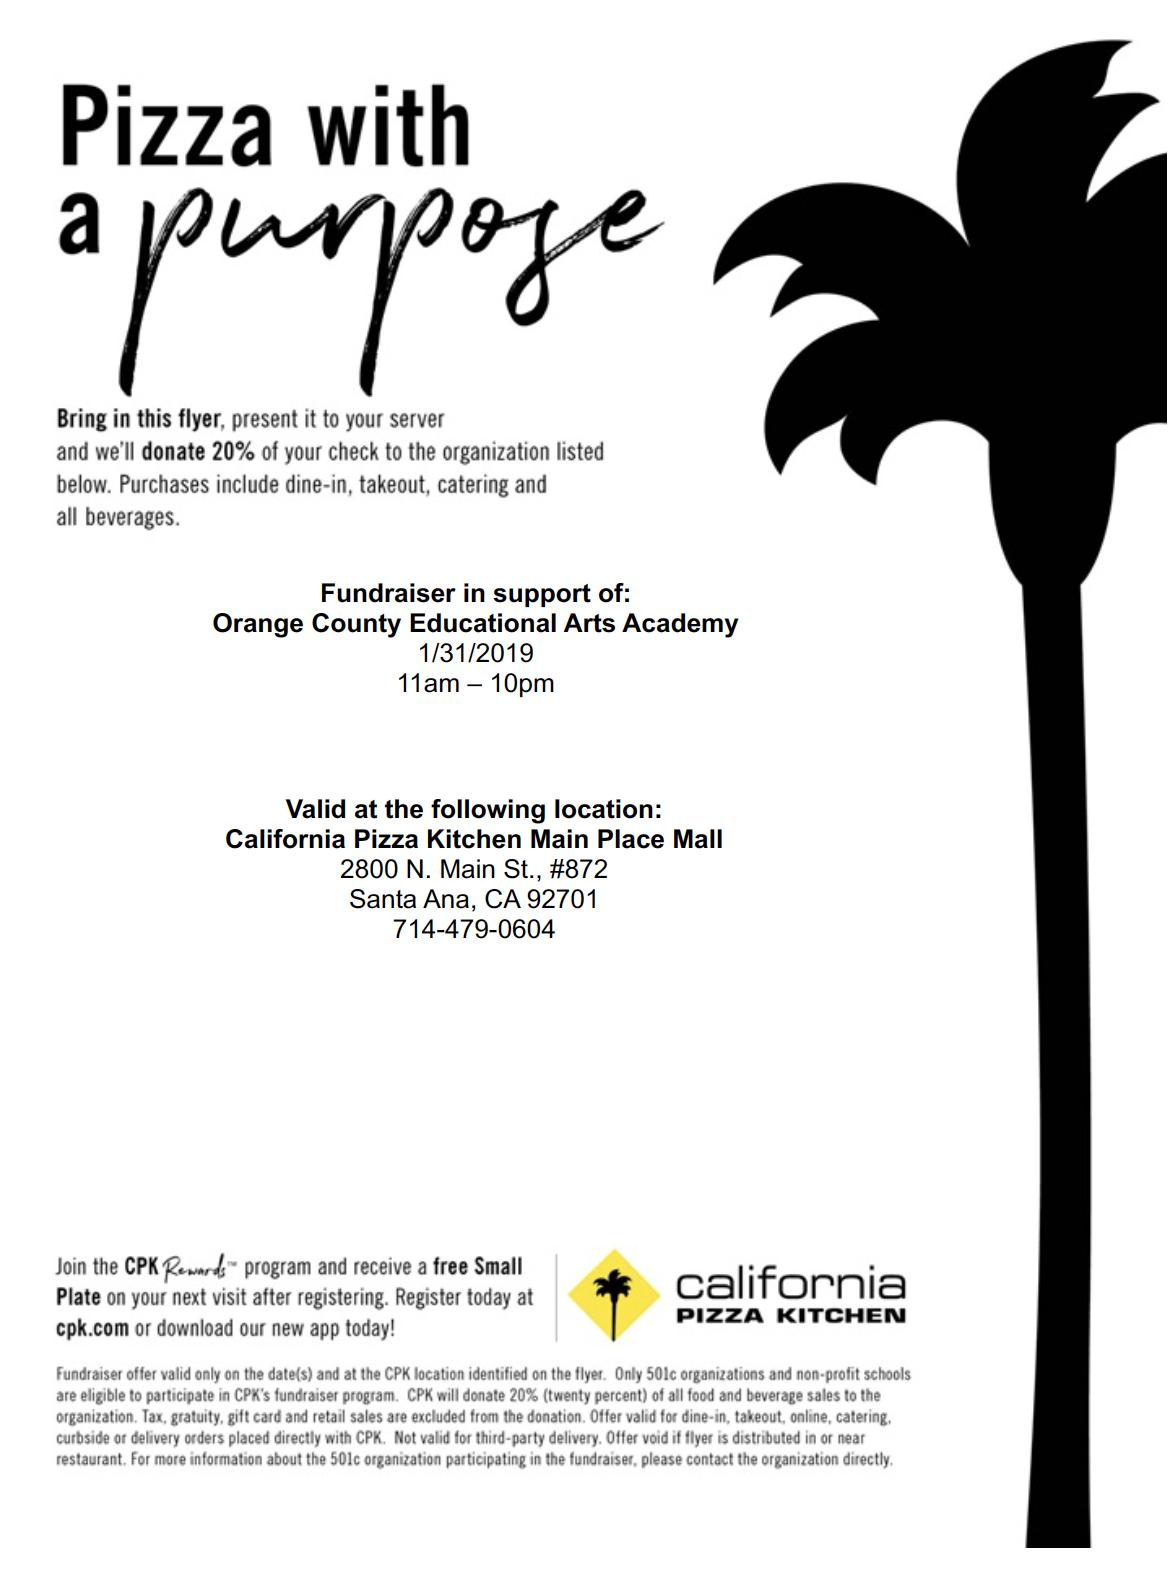 CPK Restaurant Fundraiser